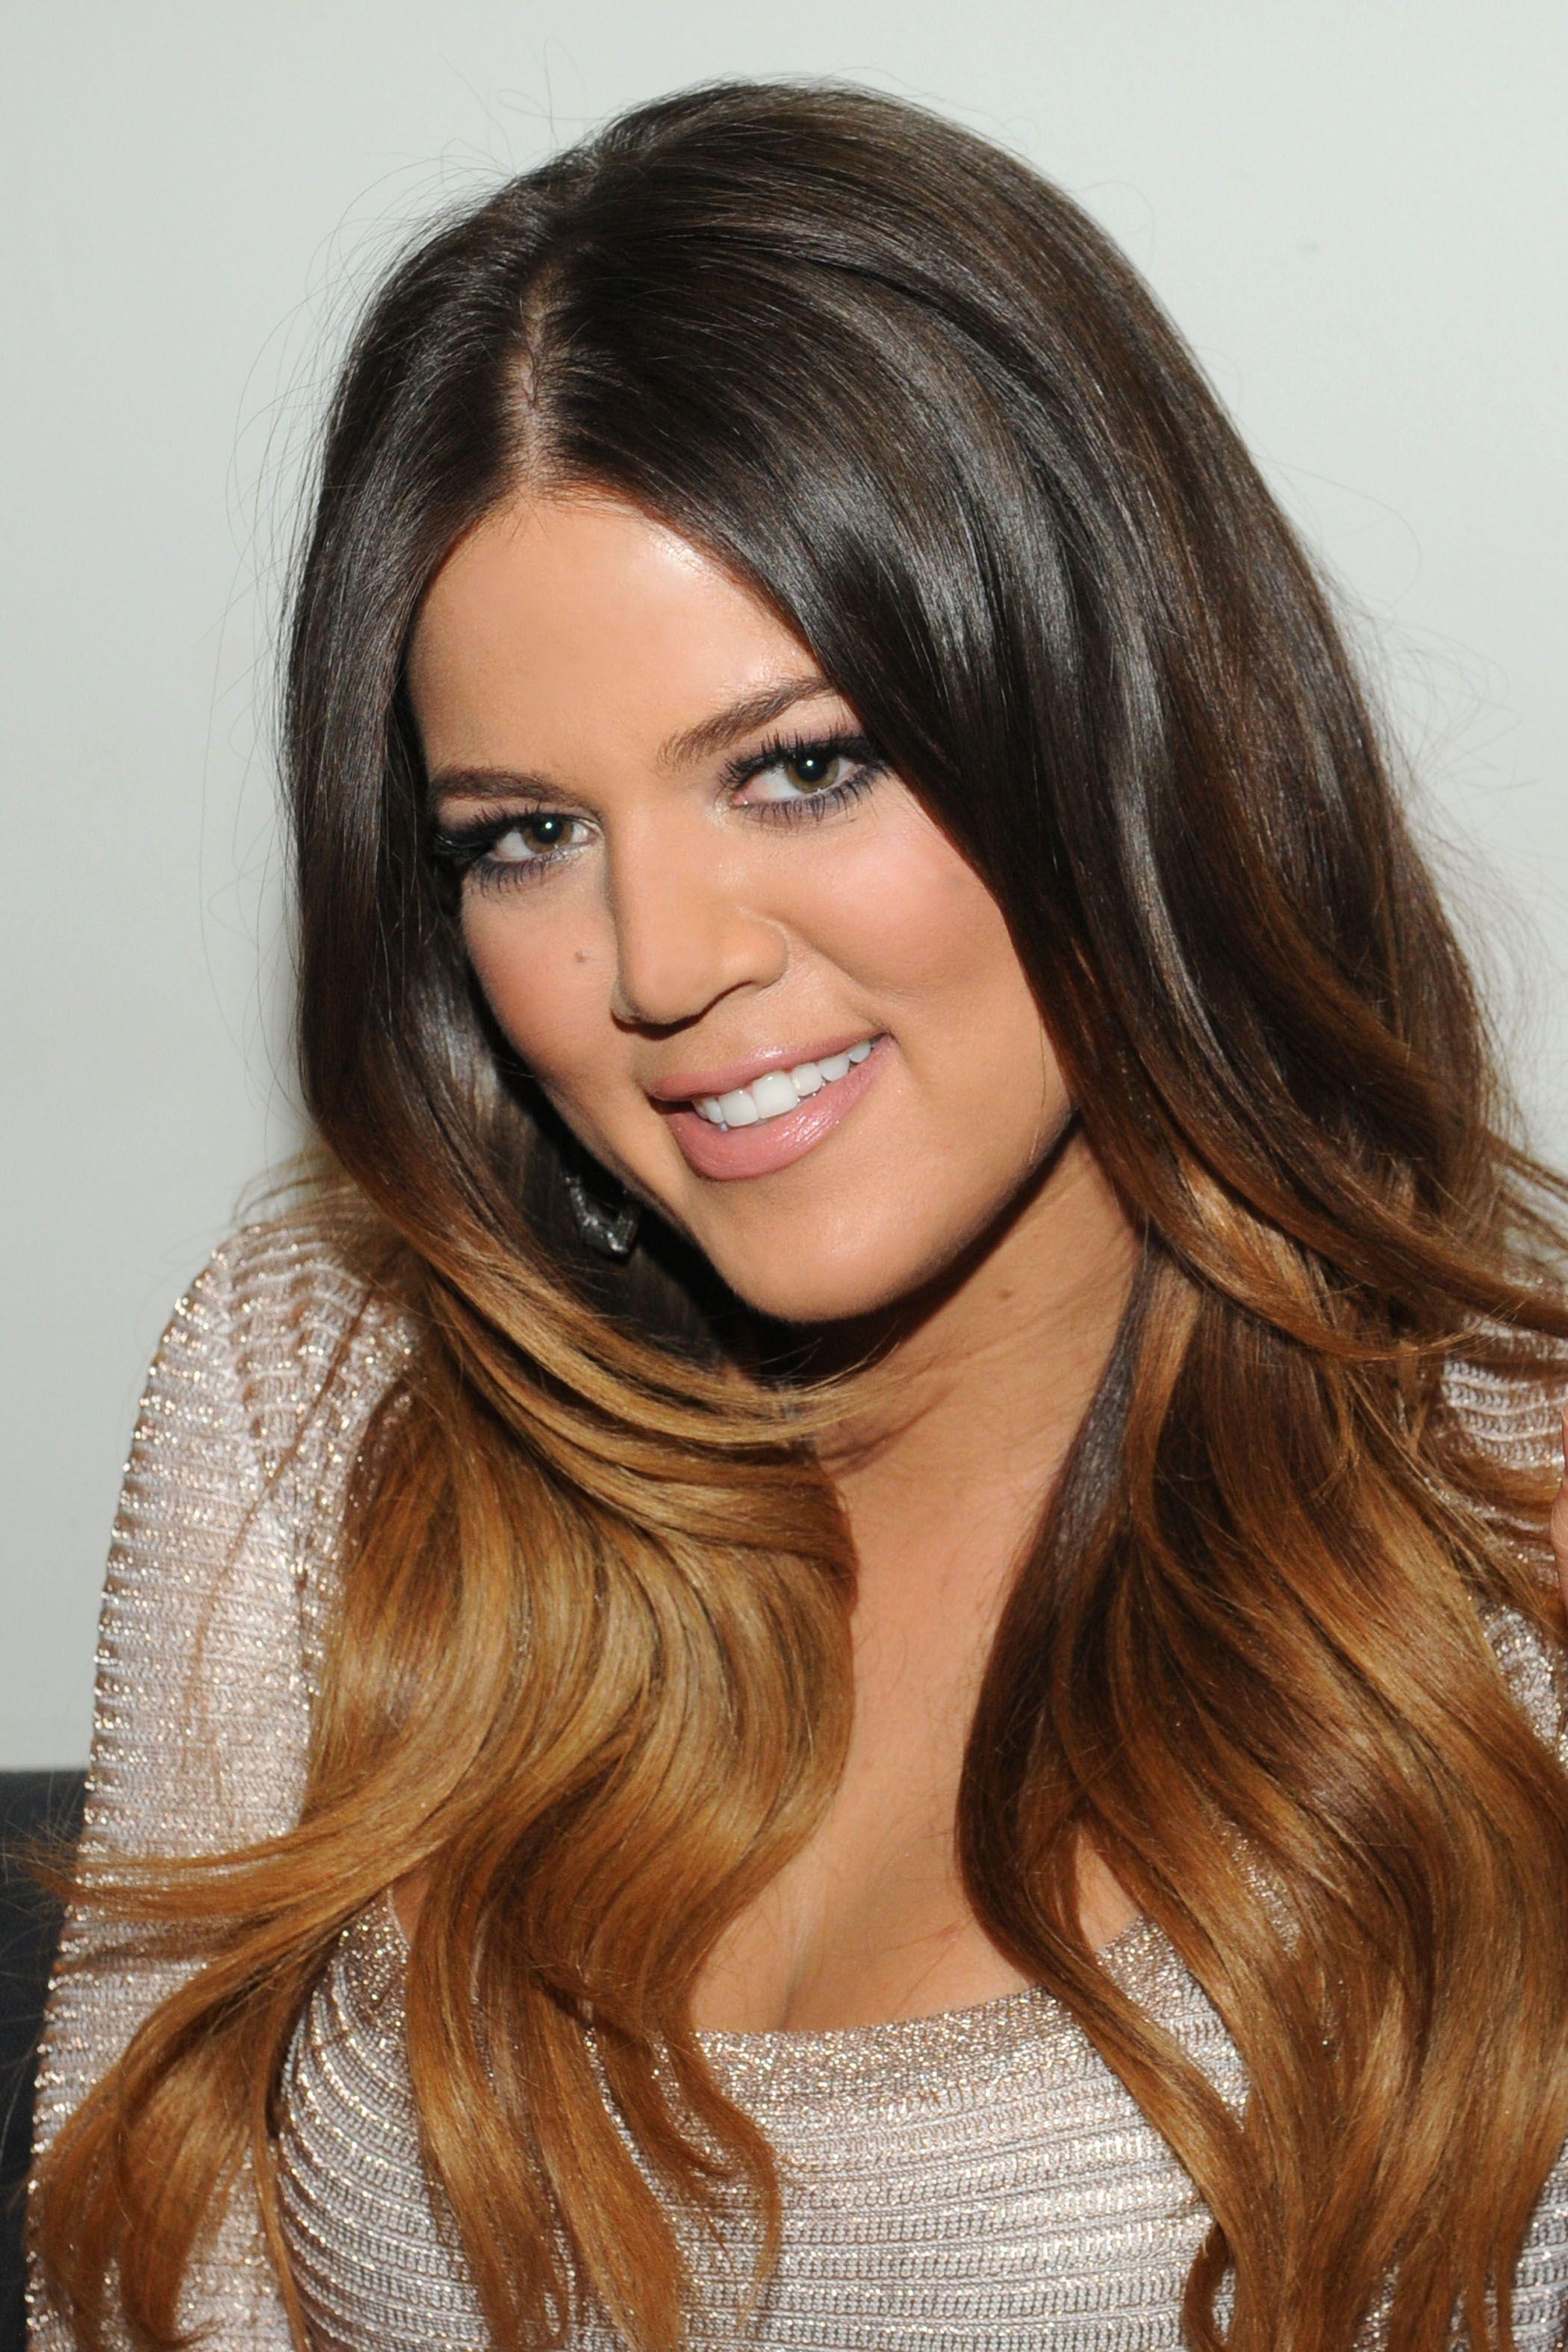 Khloe Kardashian Hairstyle Fade Haircut